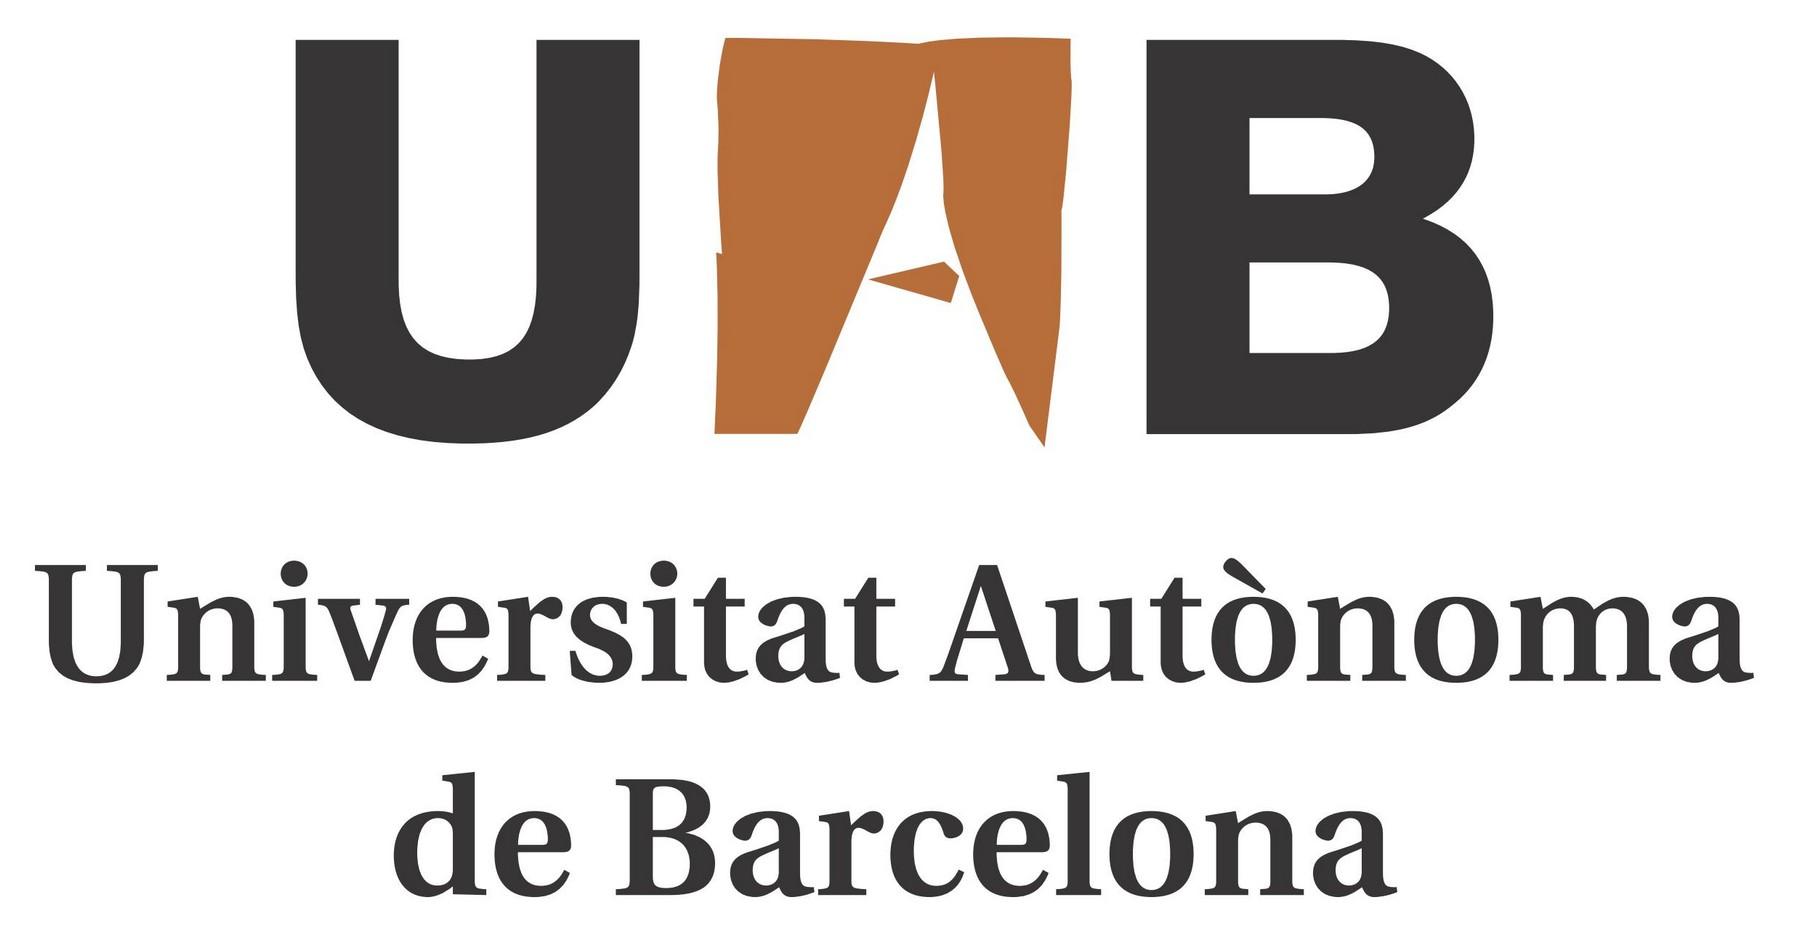 Picture Universidad Autonoma de Barcelona (UAB)